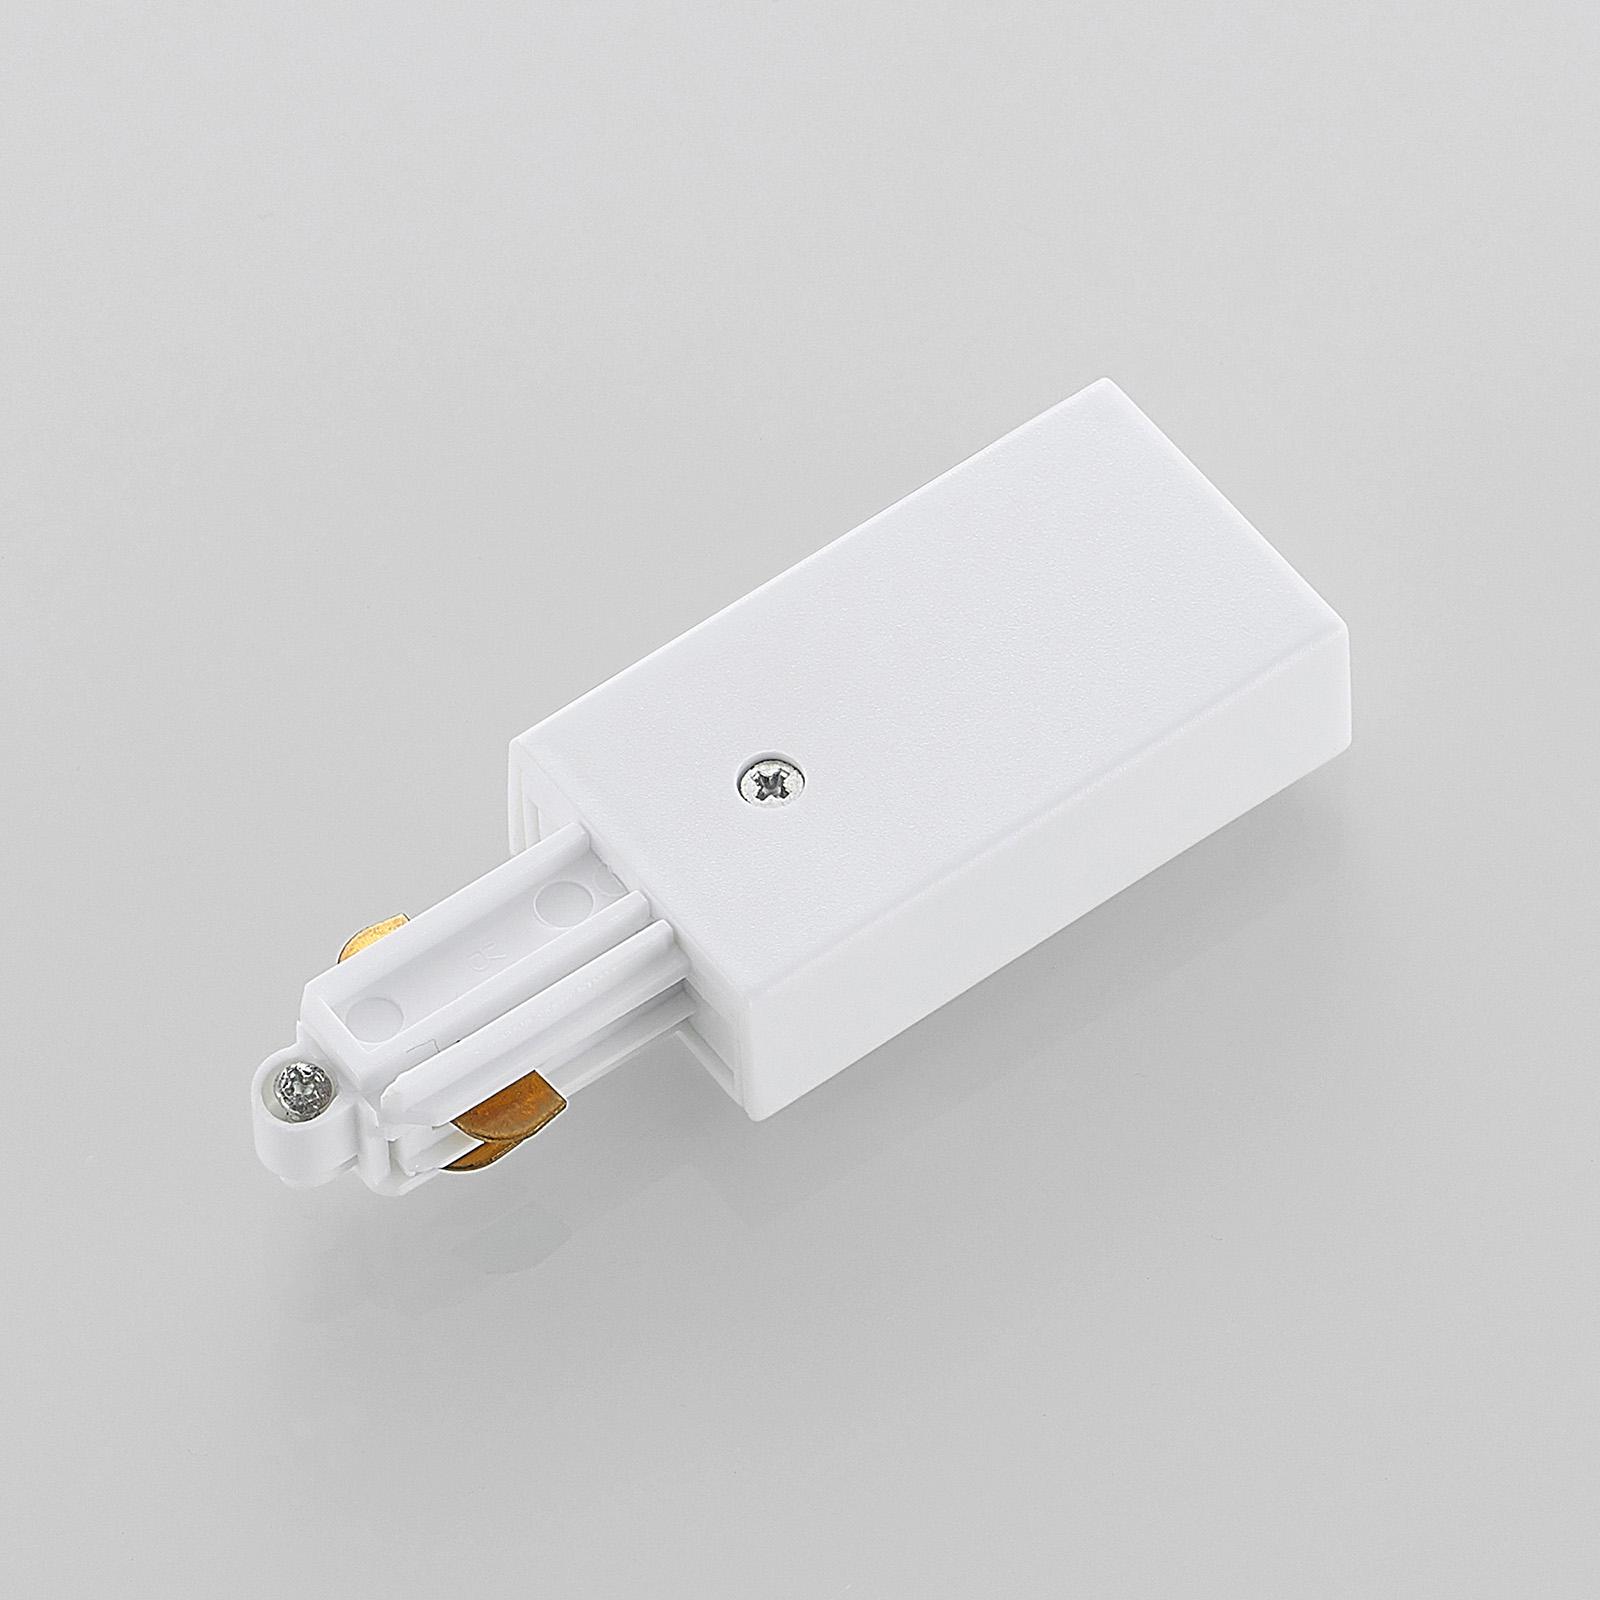 Strømforsyning til 1-fase skinnesystem, hvid